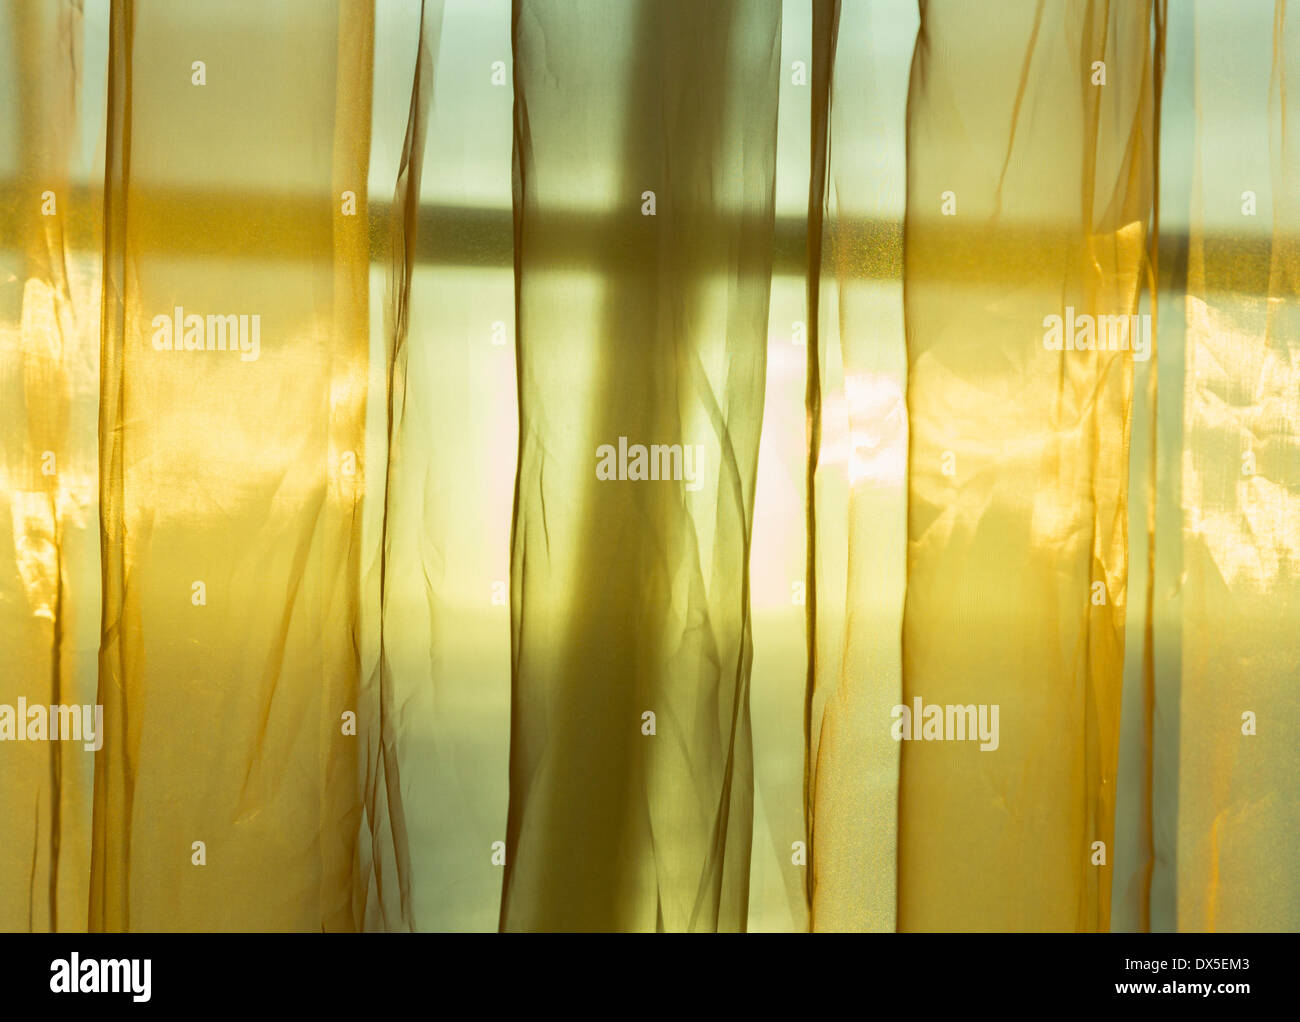 Sunlight through window streams into a room through thin golden net curtains - Stock Image